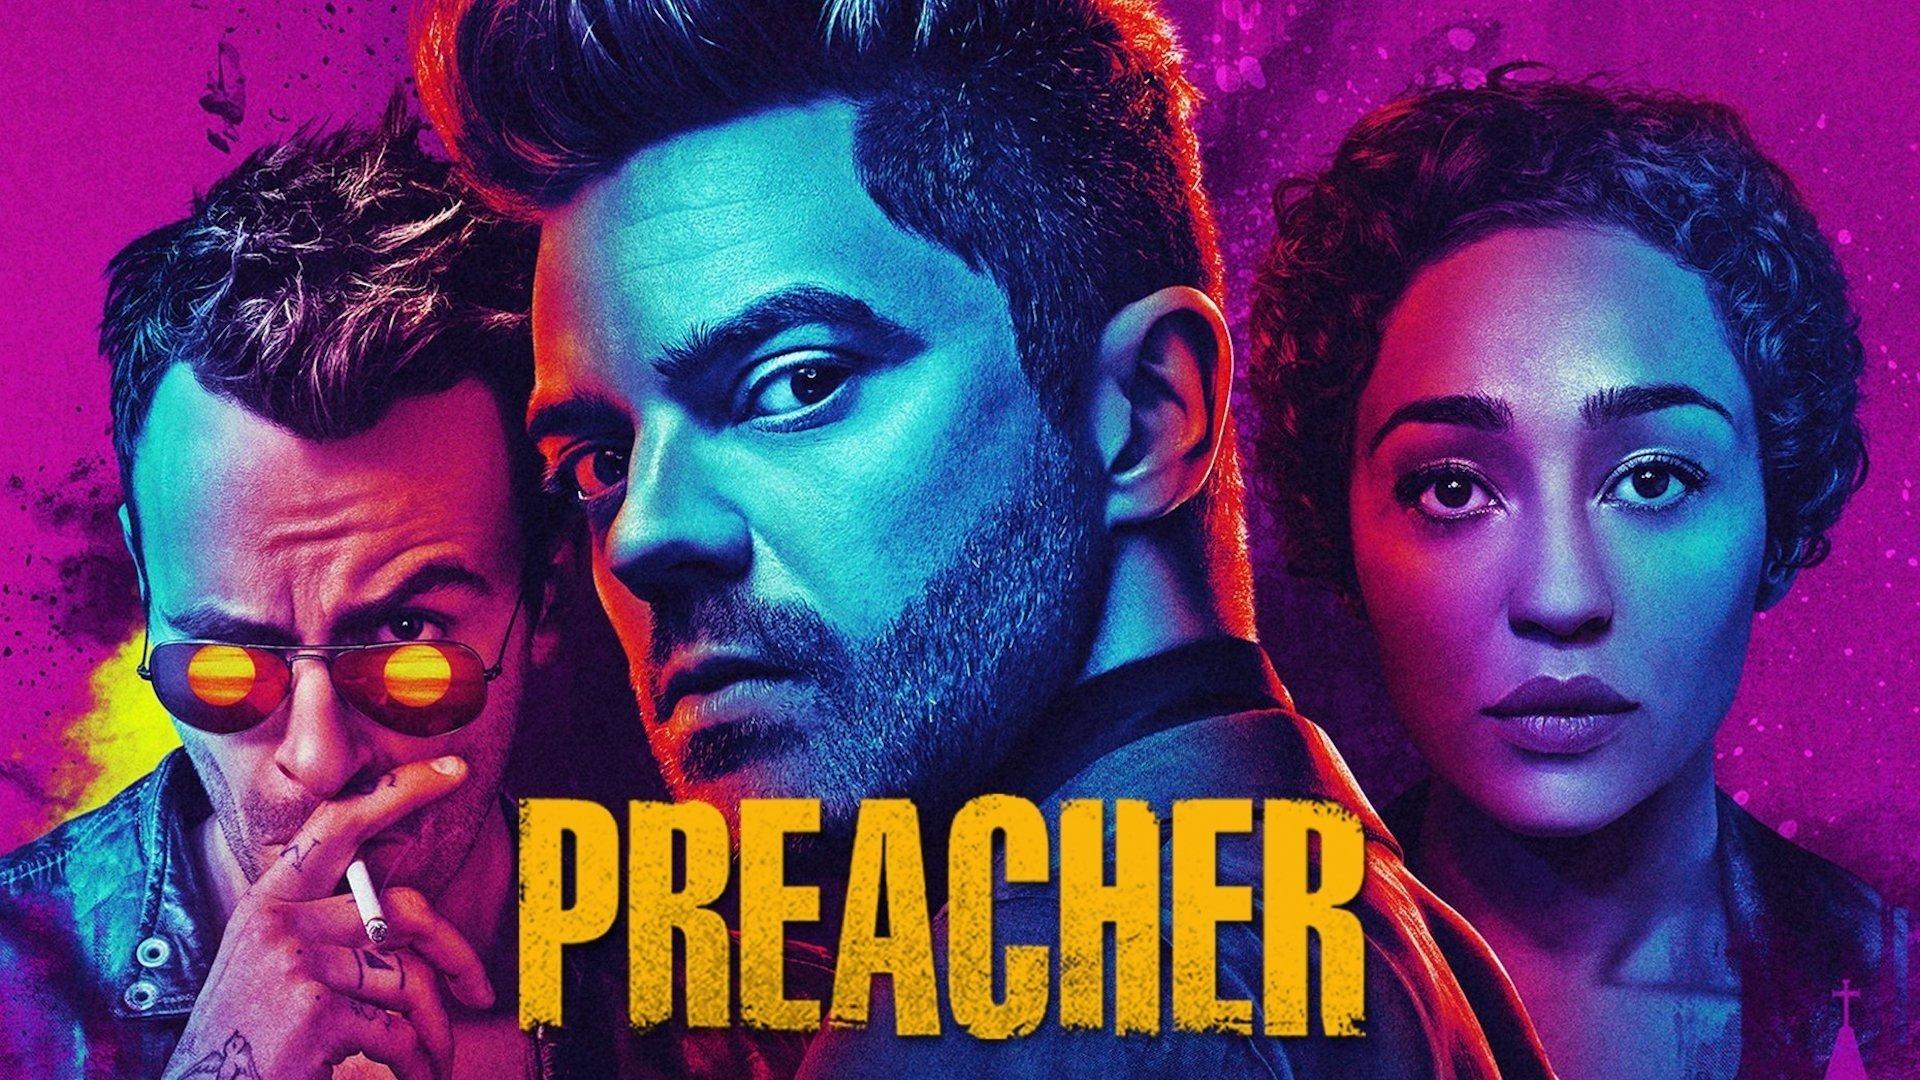 Hd Wallpaper - Preacher Season 2 Cast , HD Wallpaper & Backgrounds